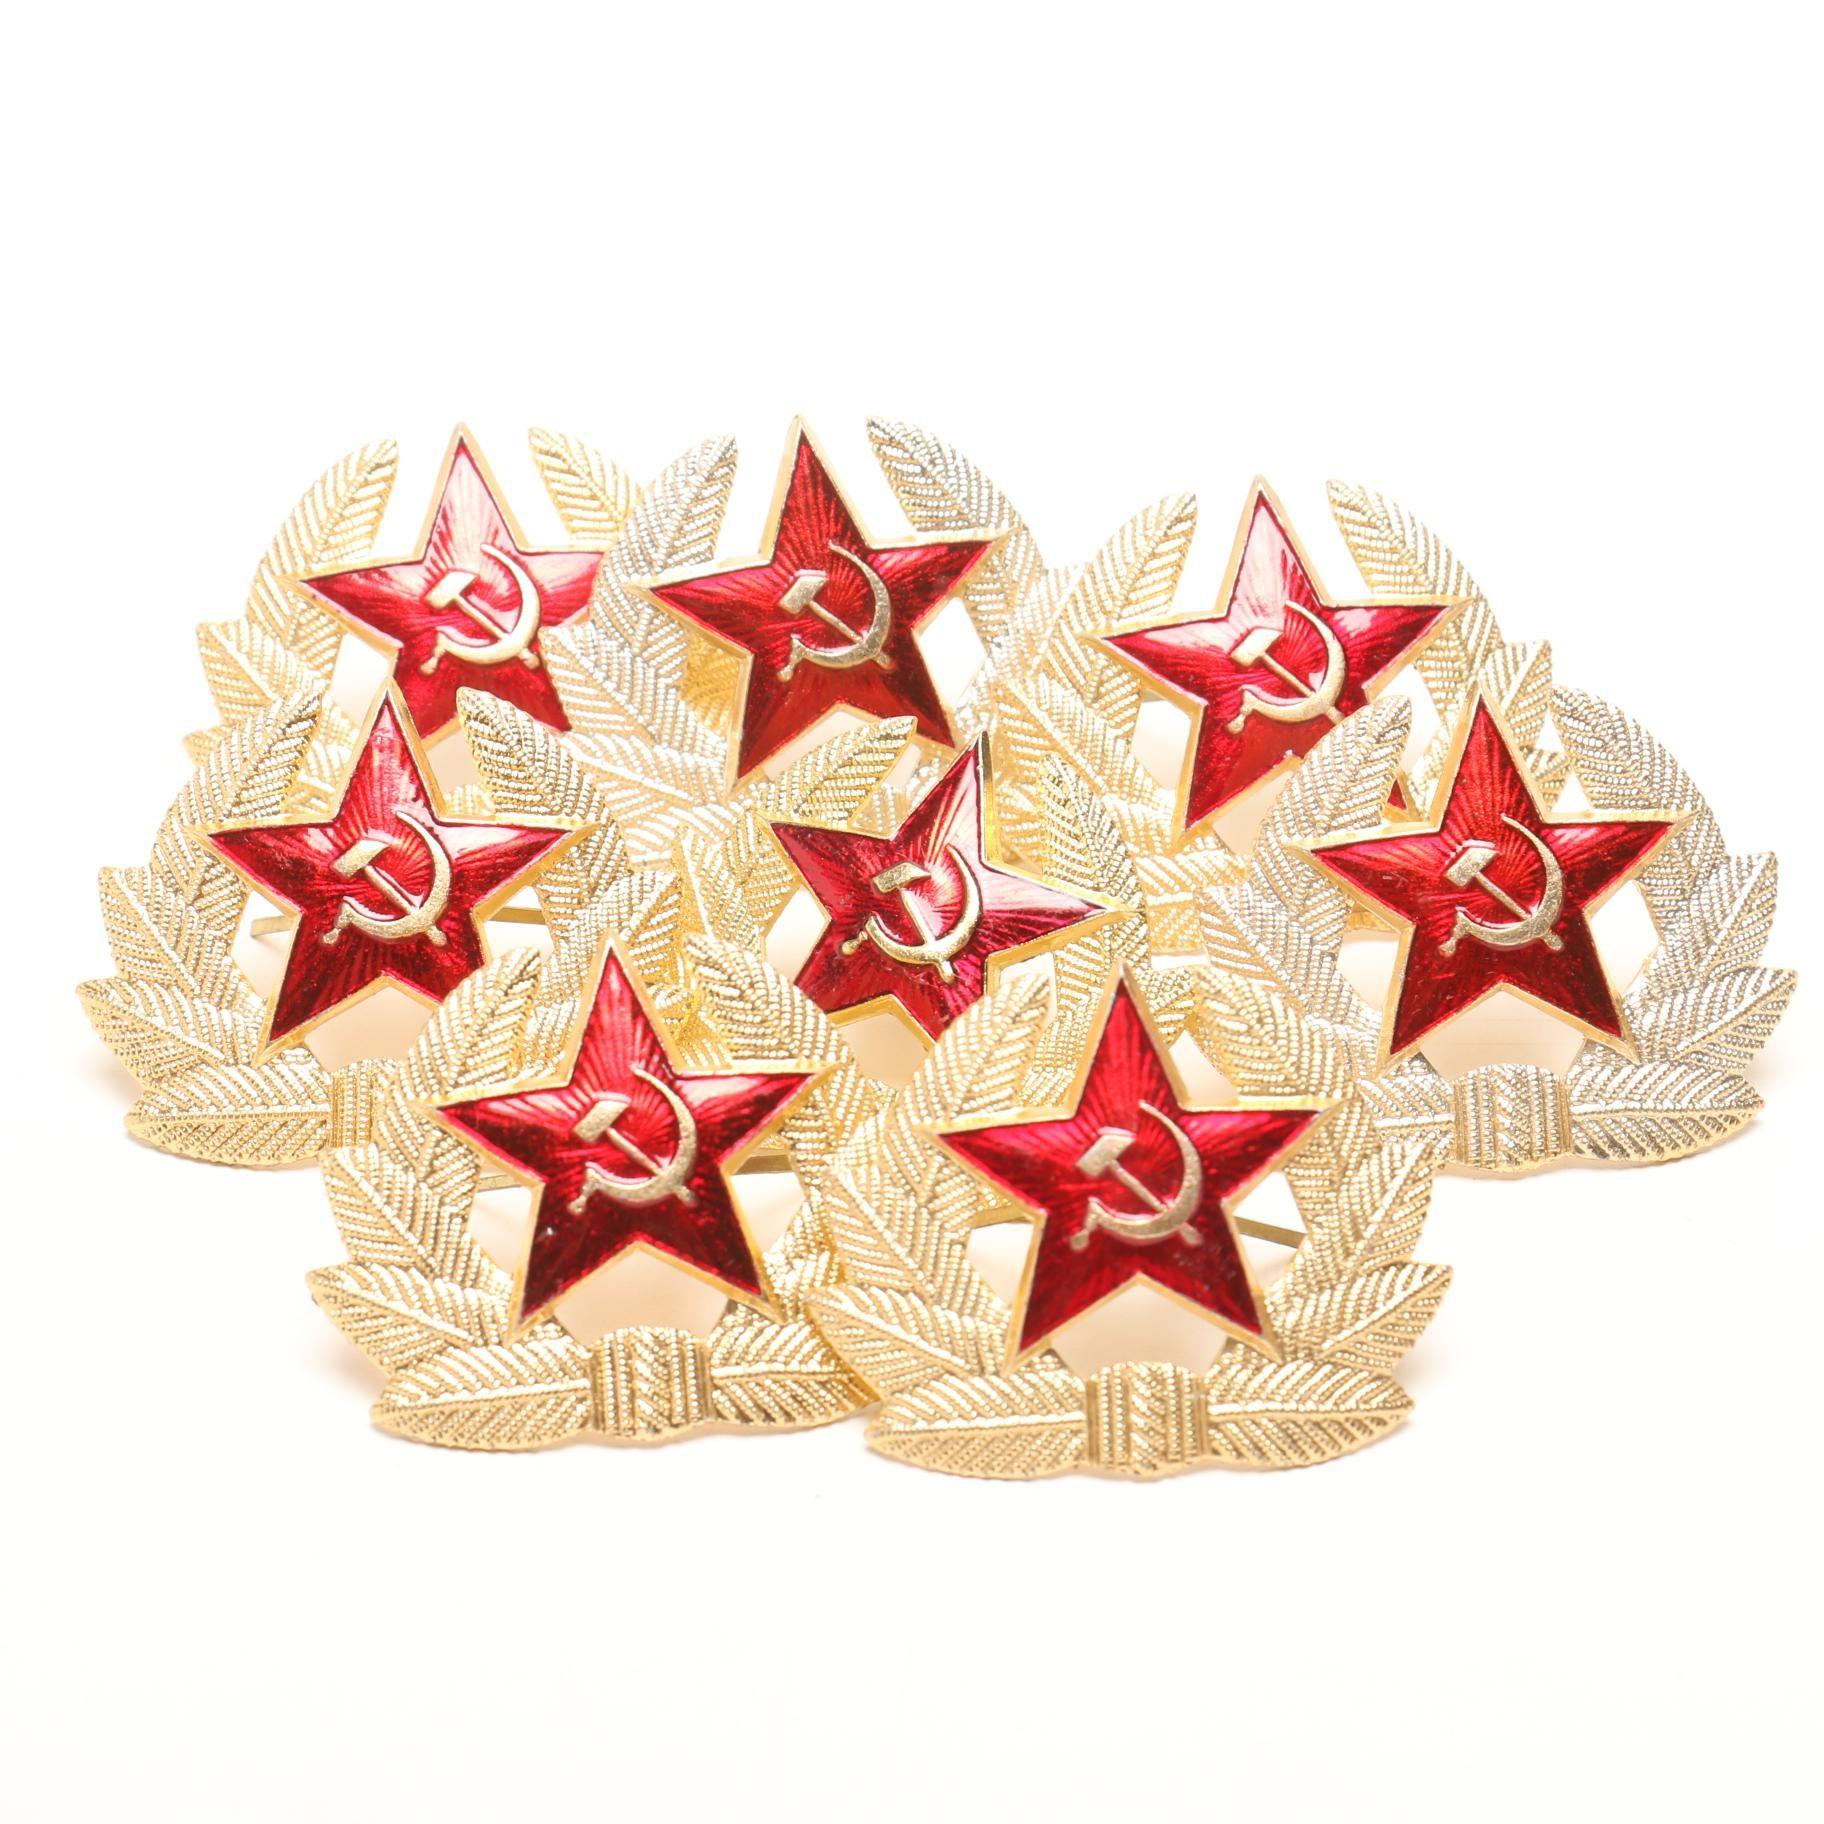 Eight Soviet Union Military Pins